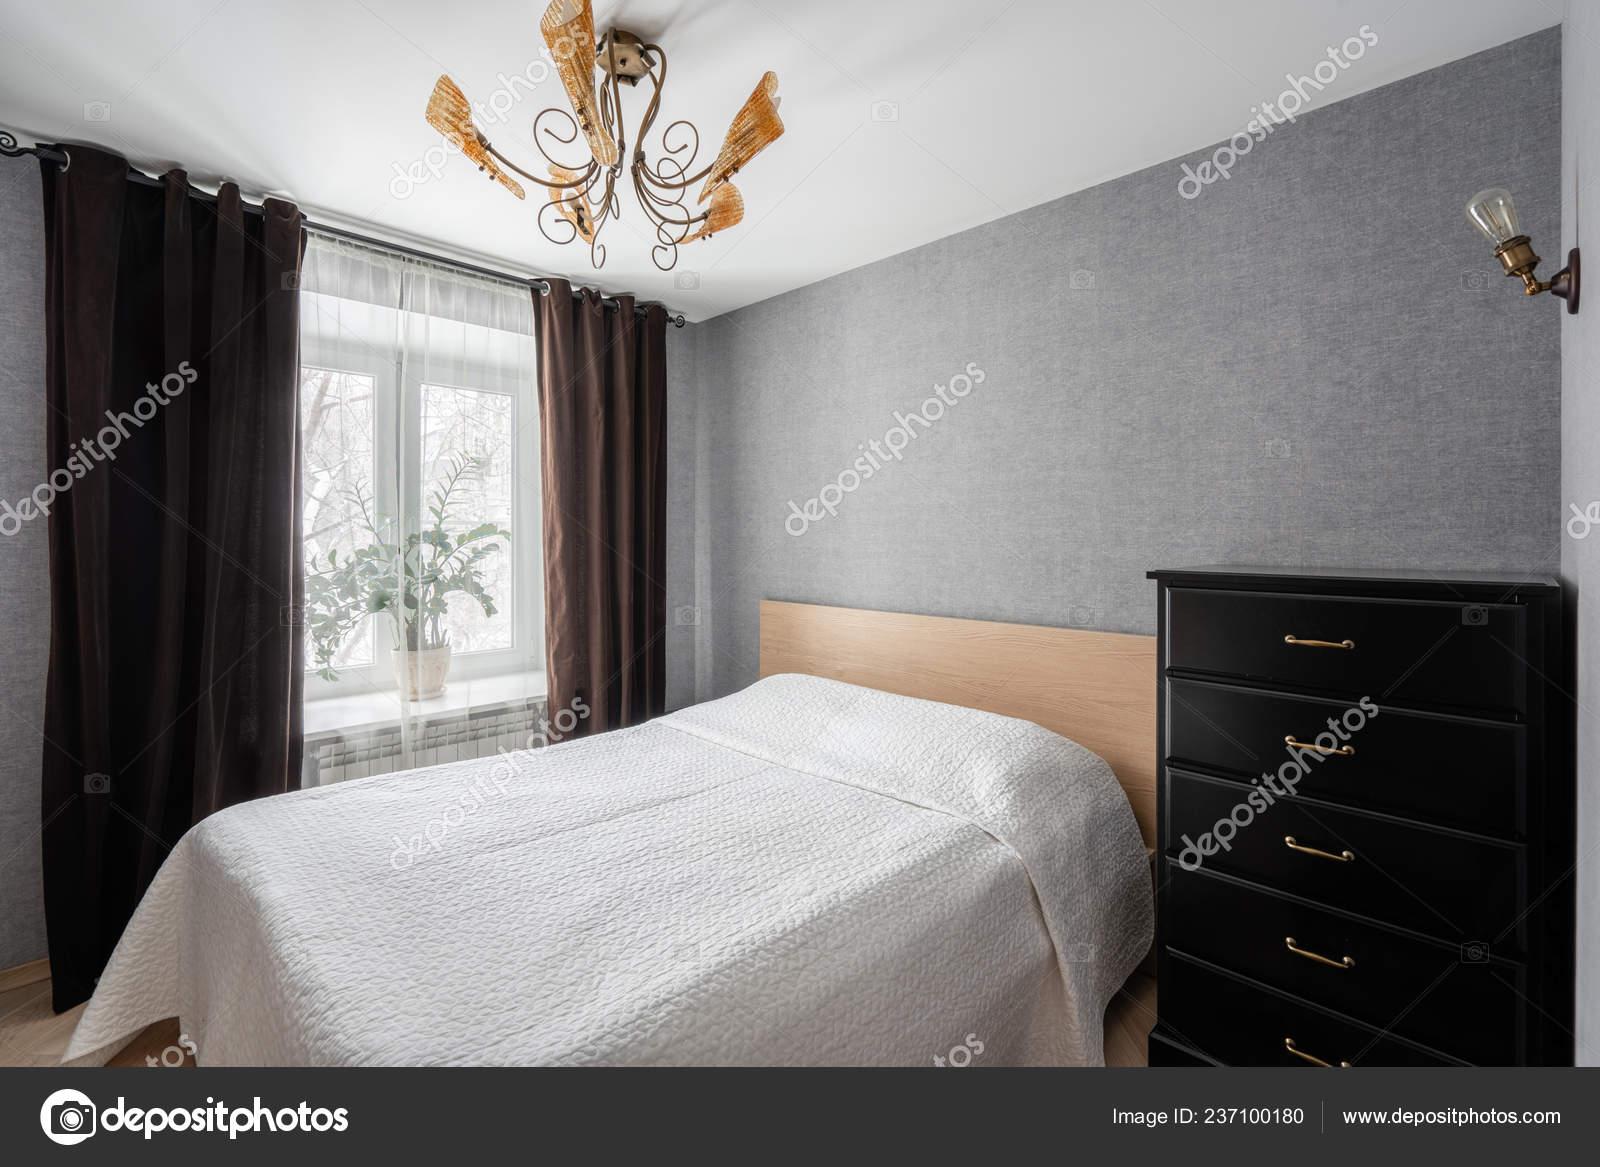 Russia, Nizhny Novgorod - 10 gennaio 2018: Appartamento ...